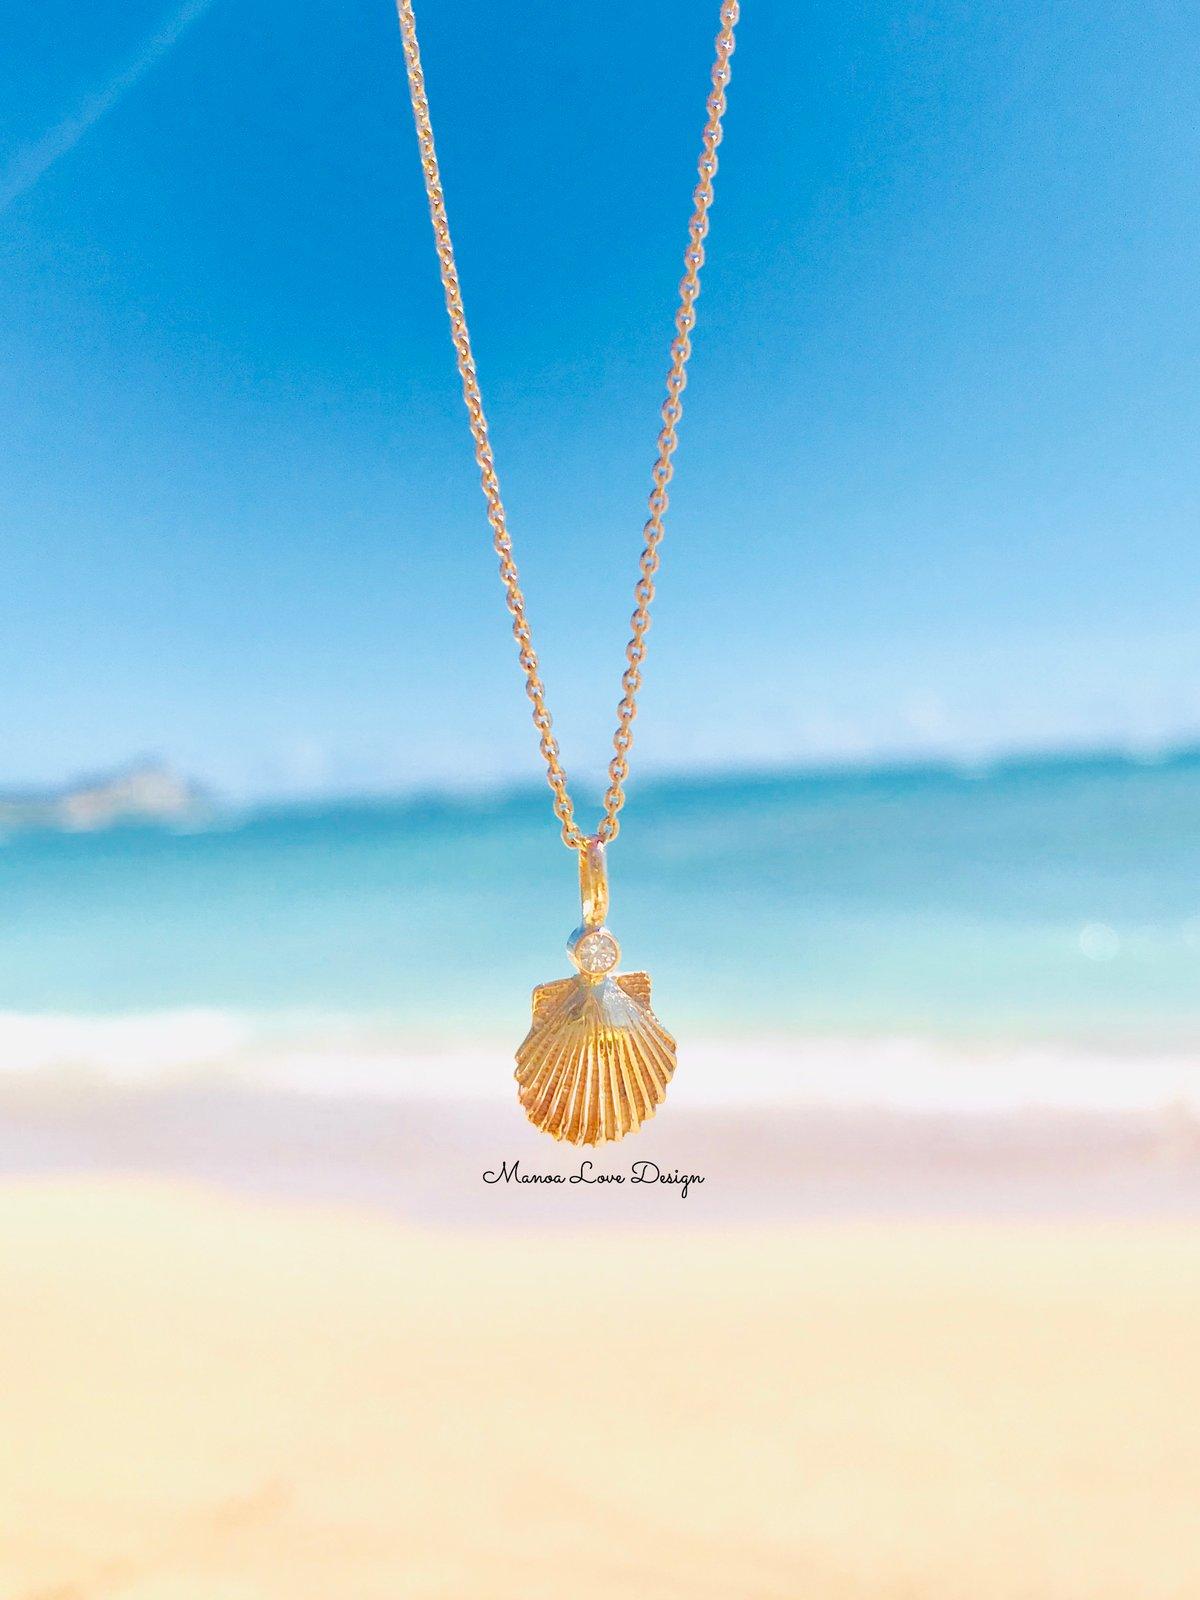 Image of Shell diamond